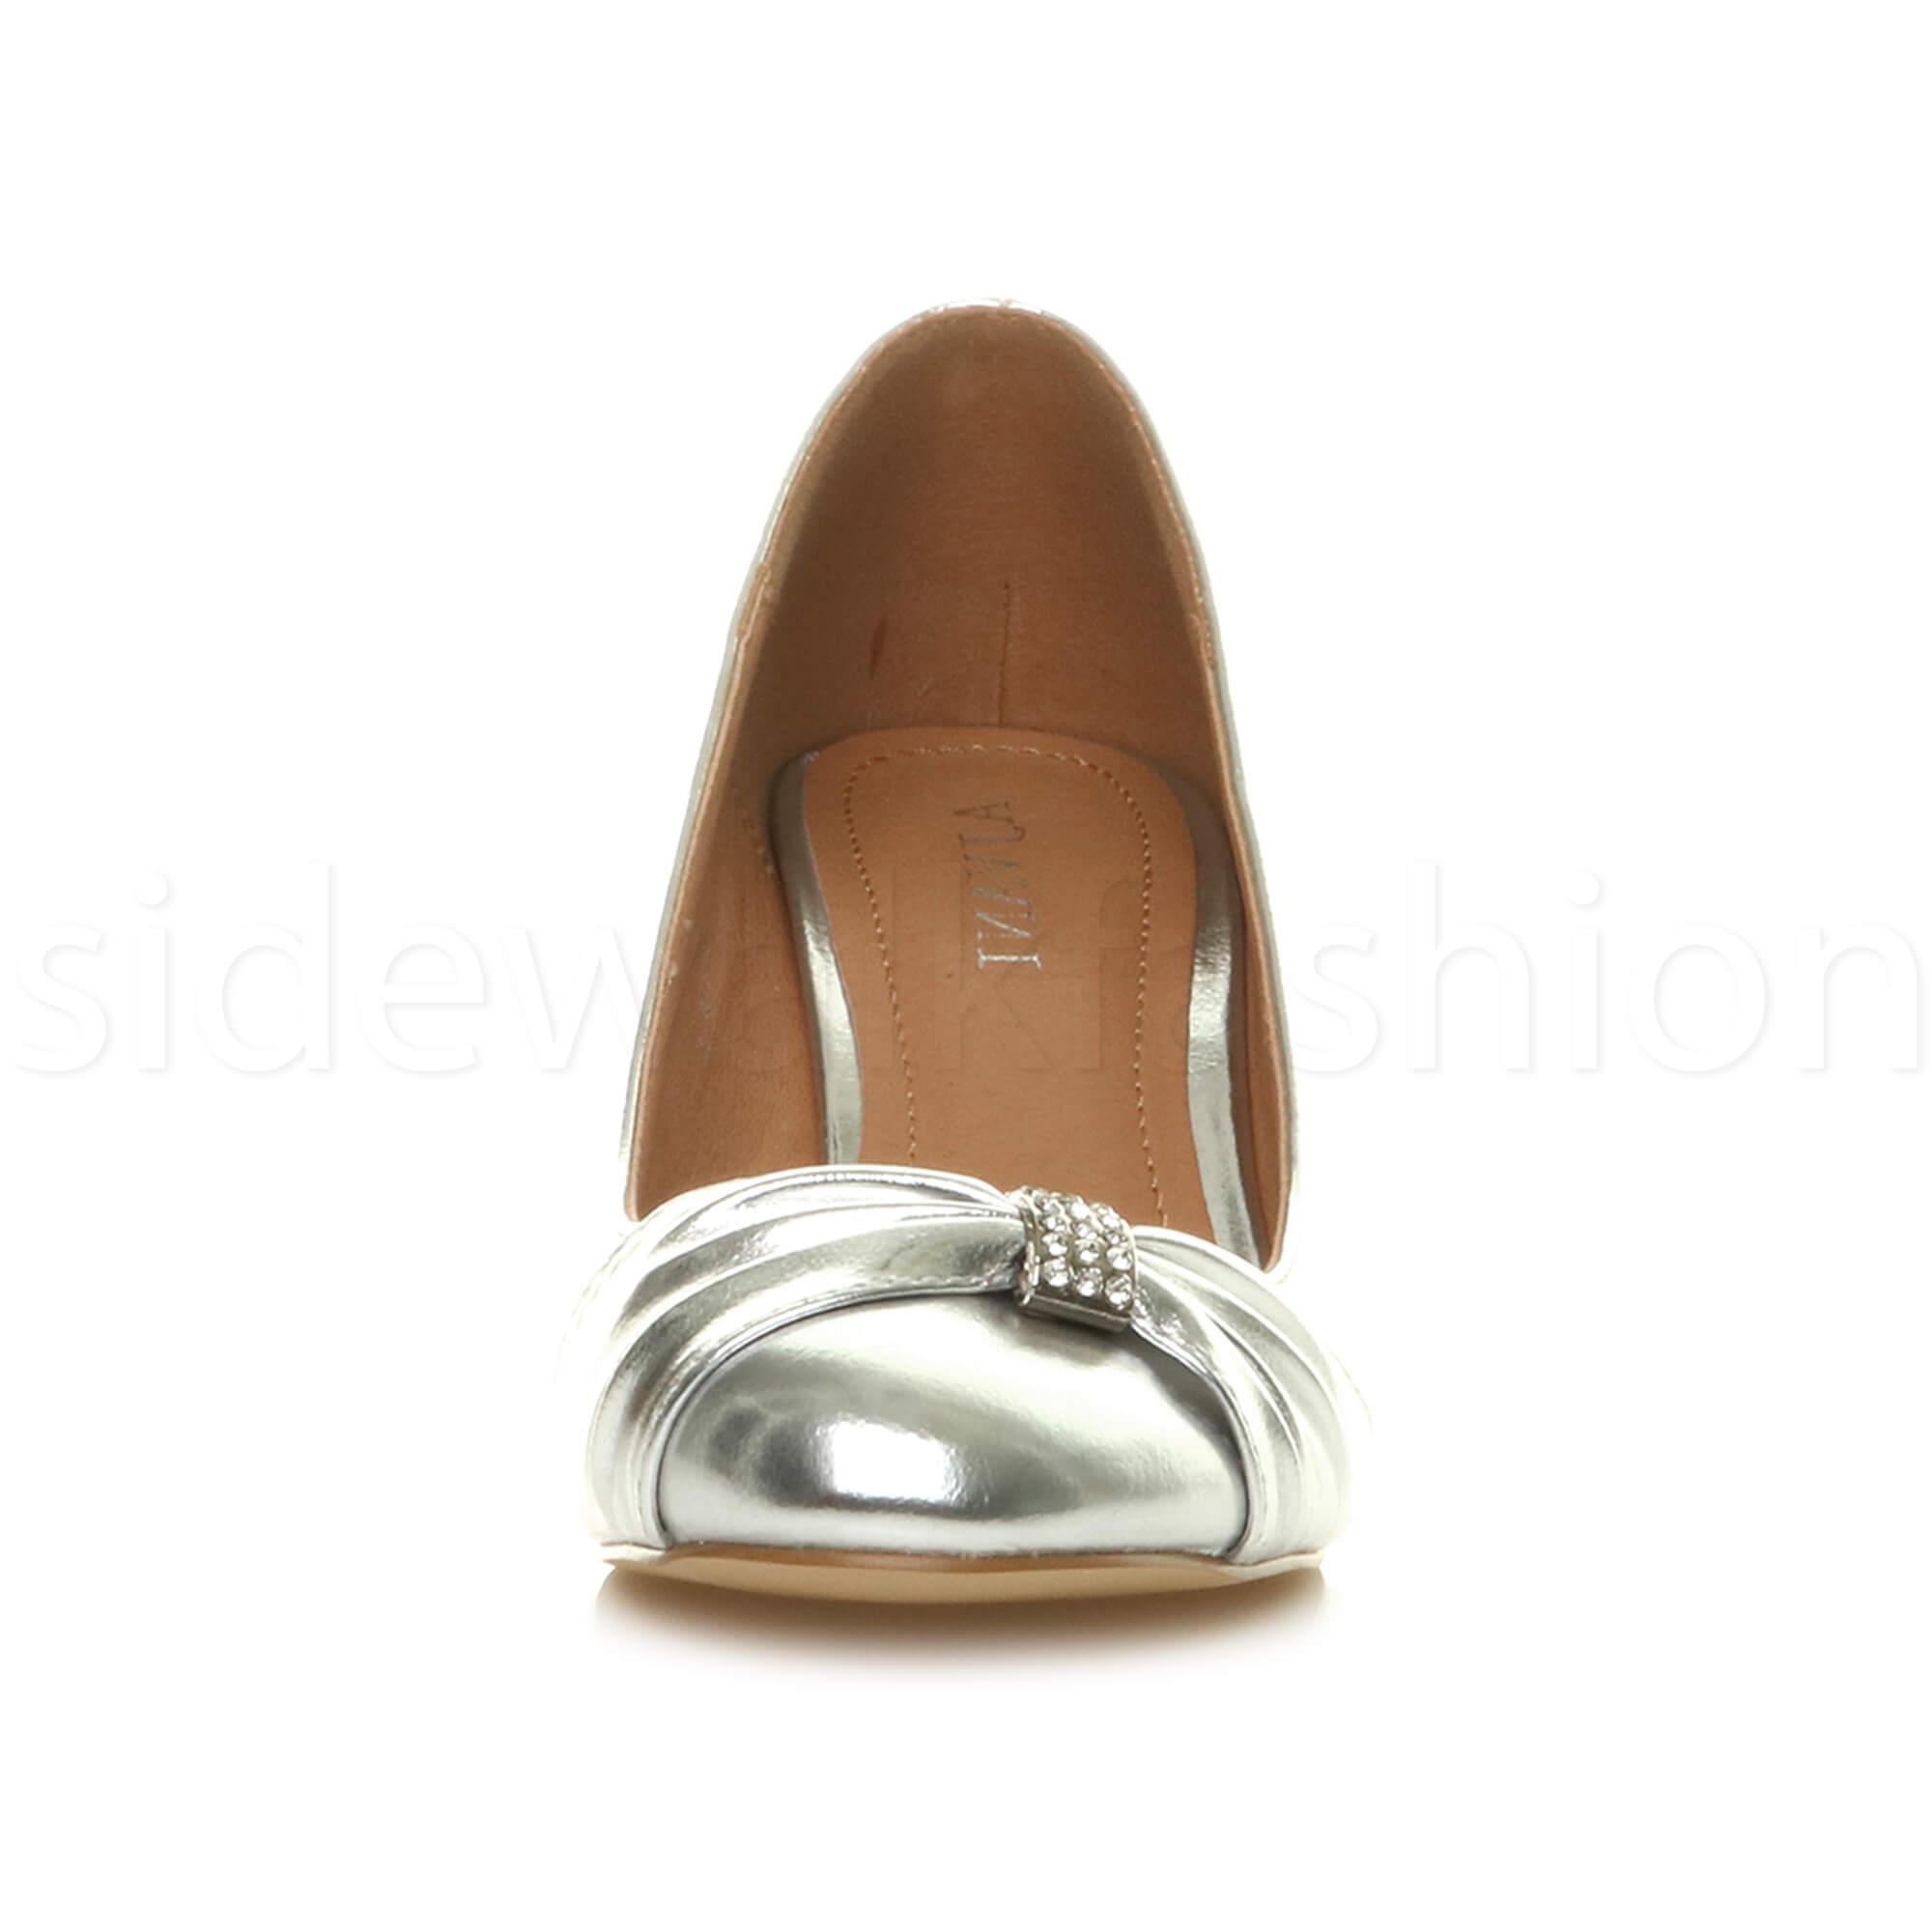 Womens-ladies-low-mid-heel-diamante-party-smart-evening-court-shoes-size thumbnail 87